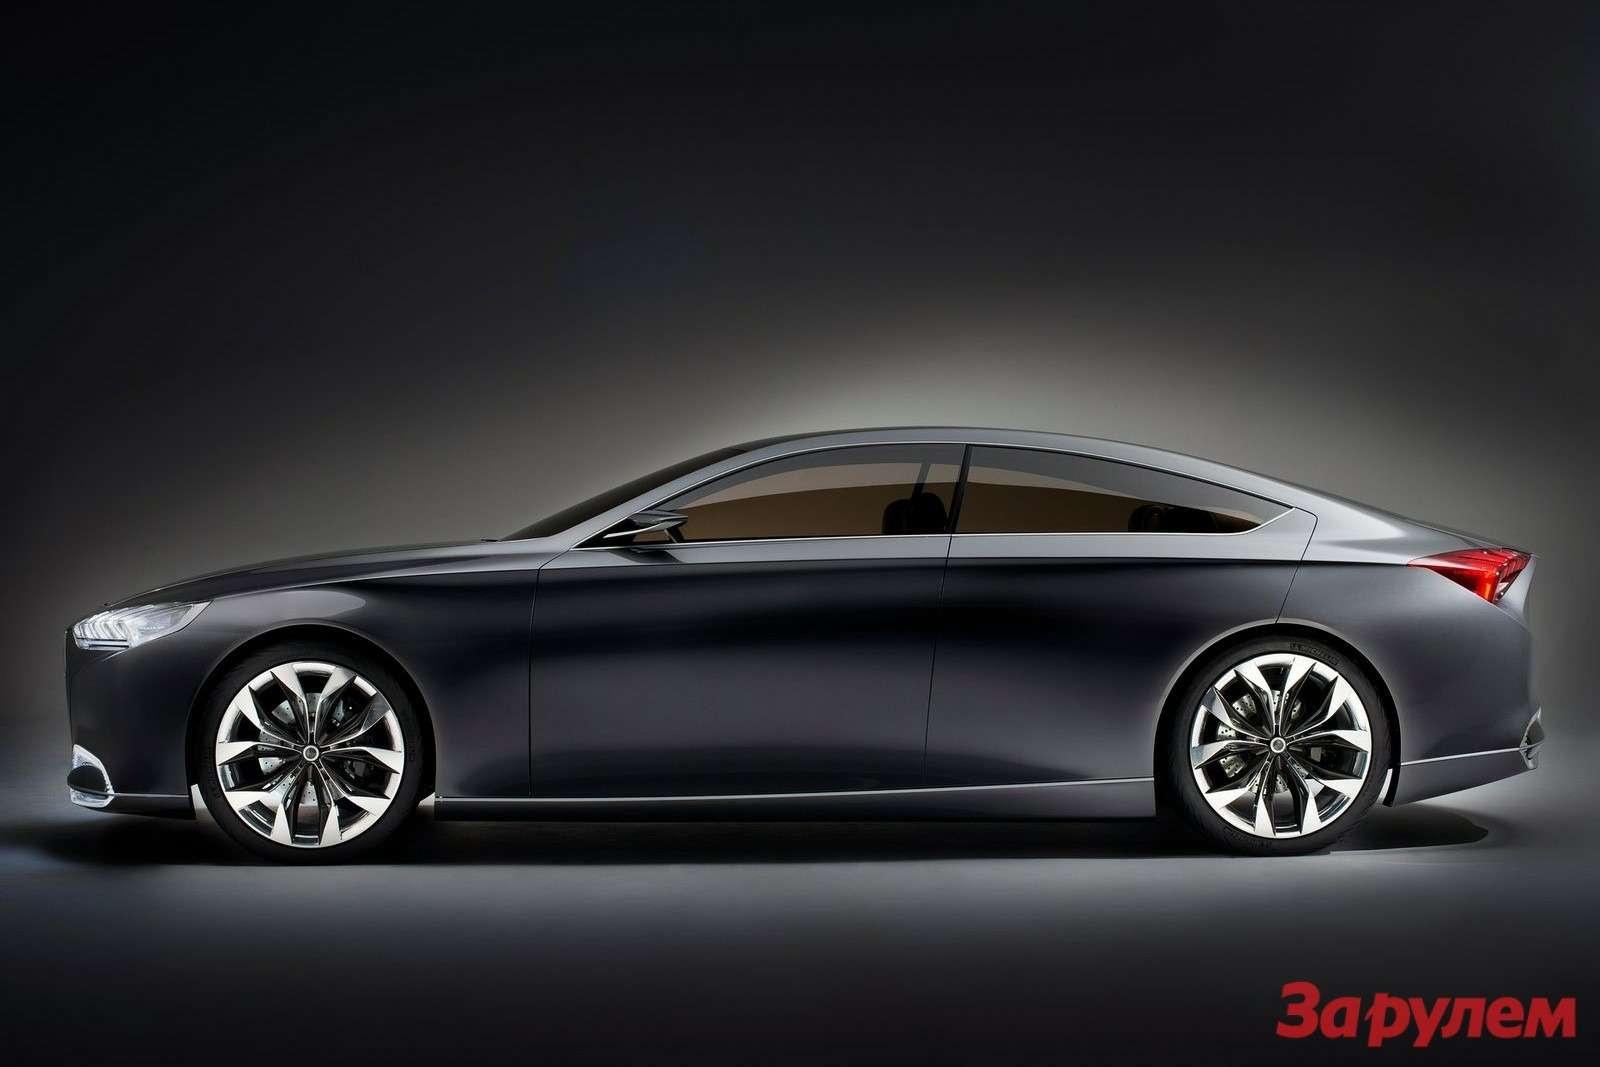 Hyundai-HCD-14_Genesis_Concept_2013_1600x1200_wallpaper_02